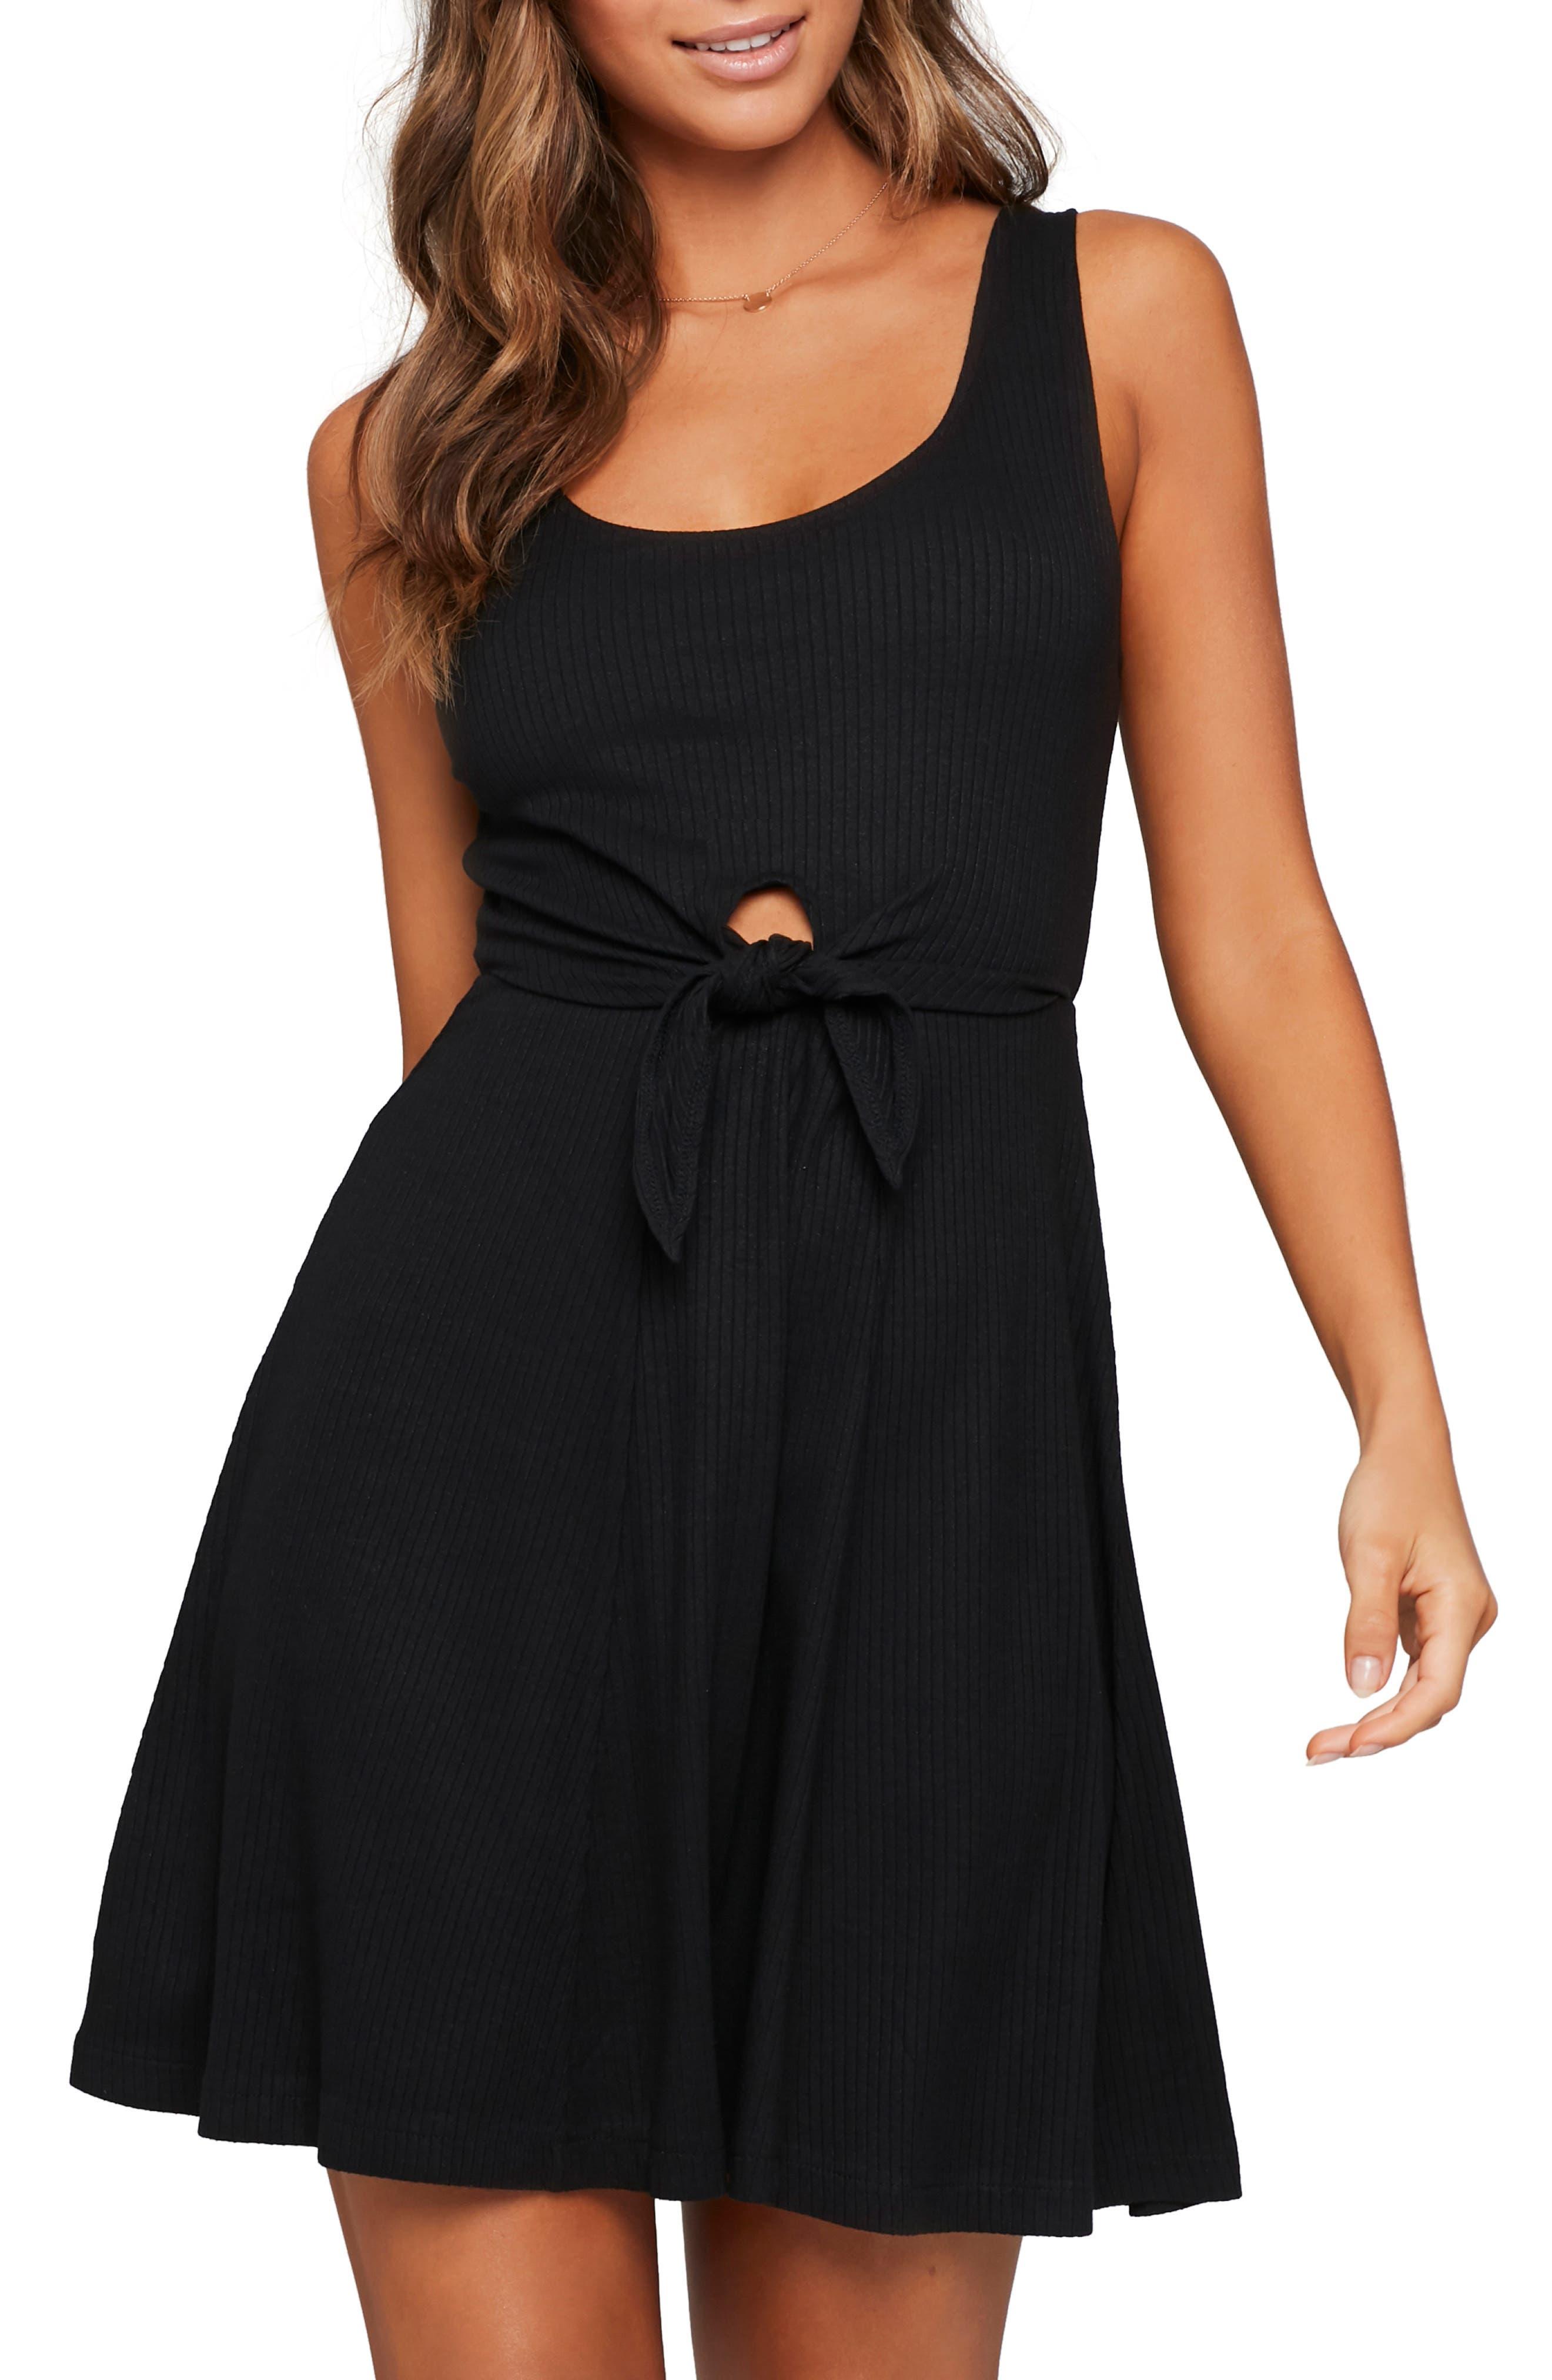 Topanga Ribbed Cover-Up Dress, Main, color, BLACK